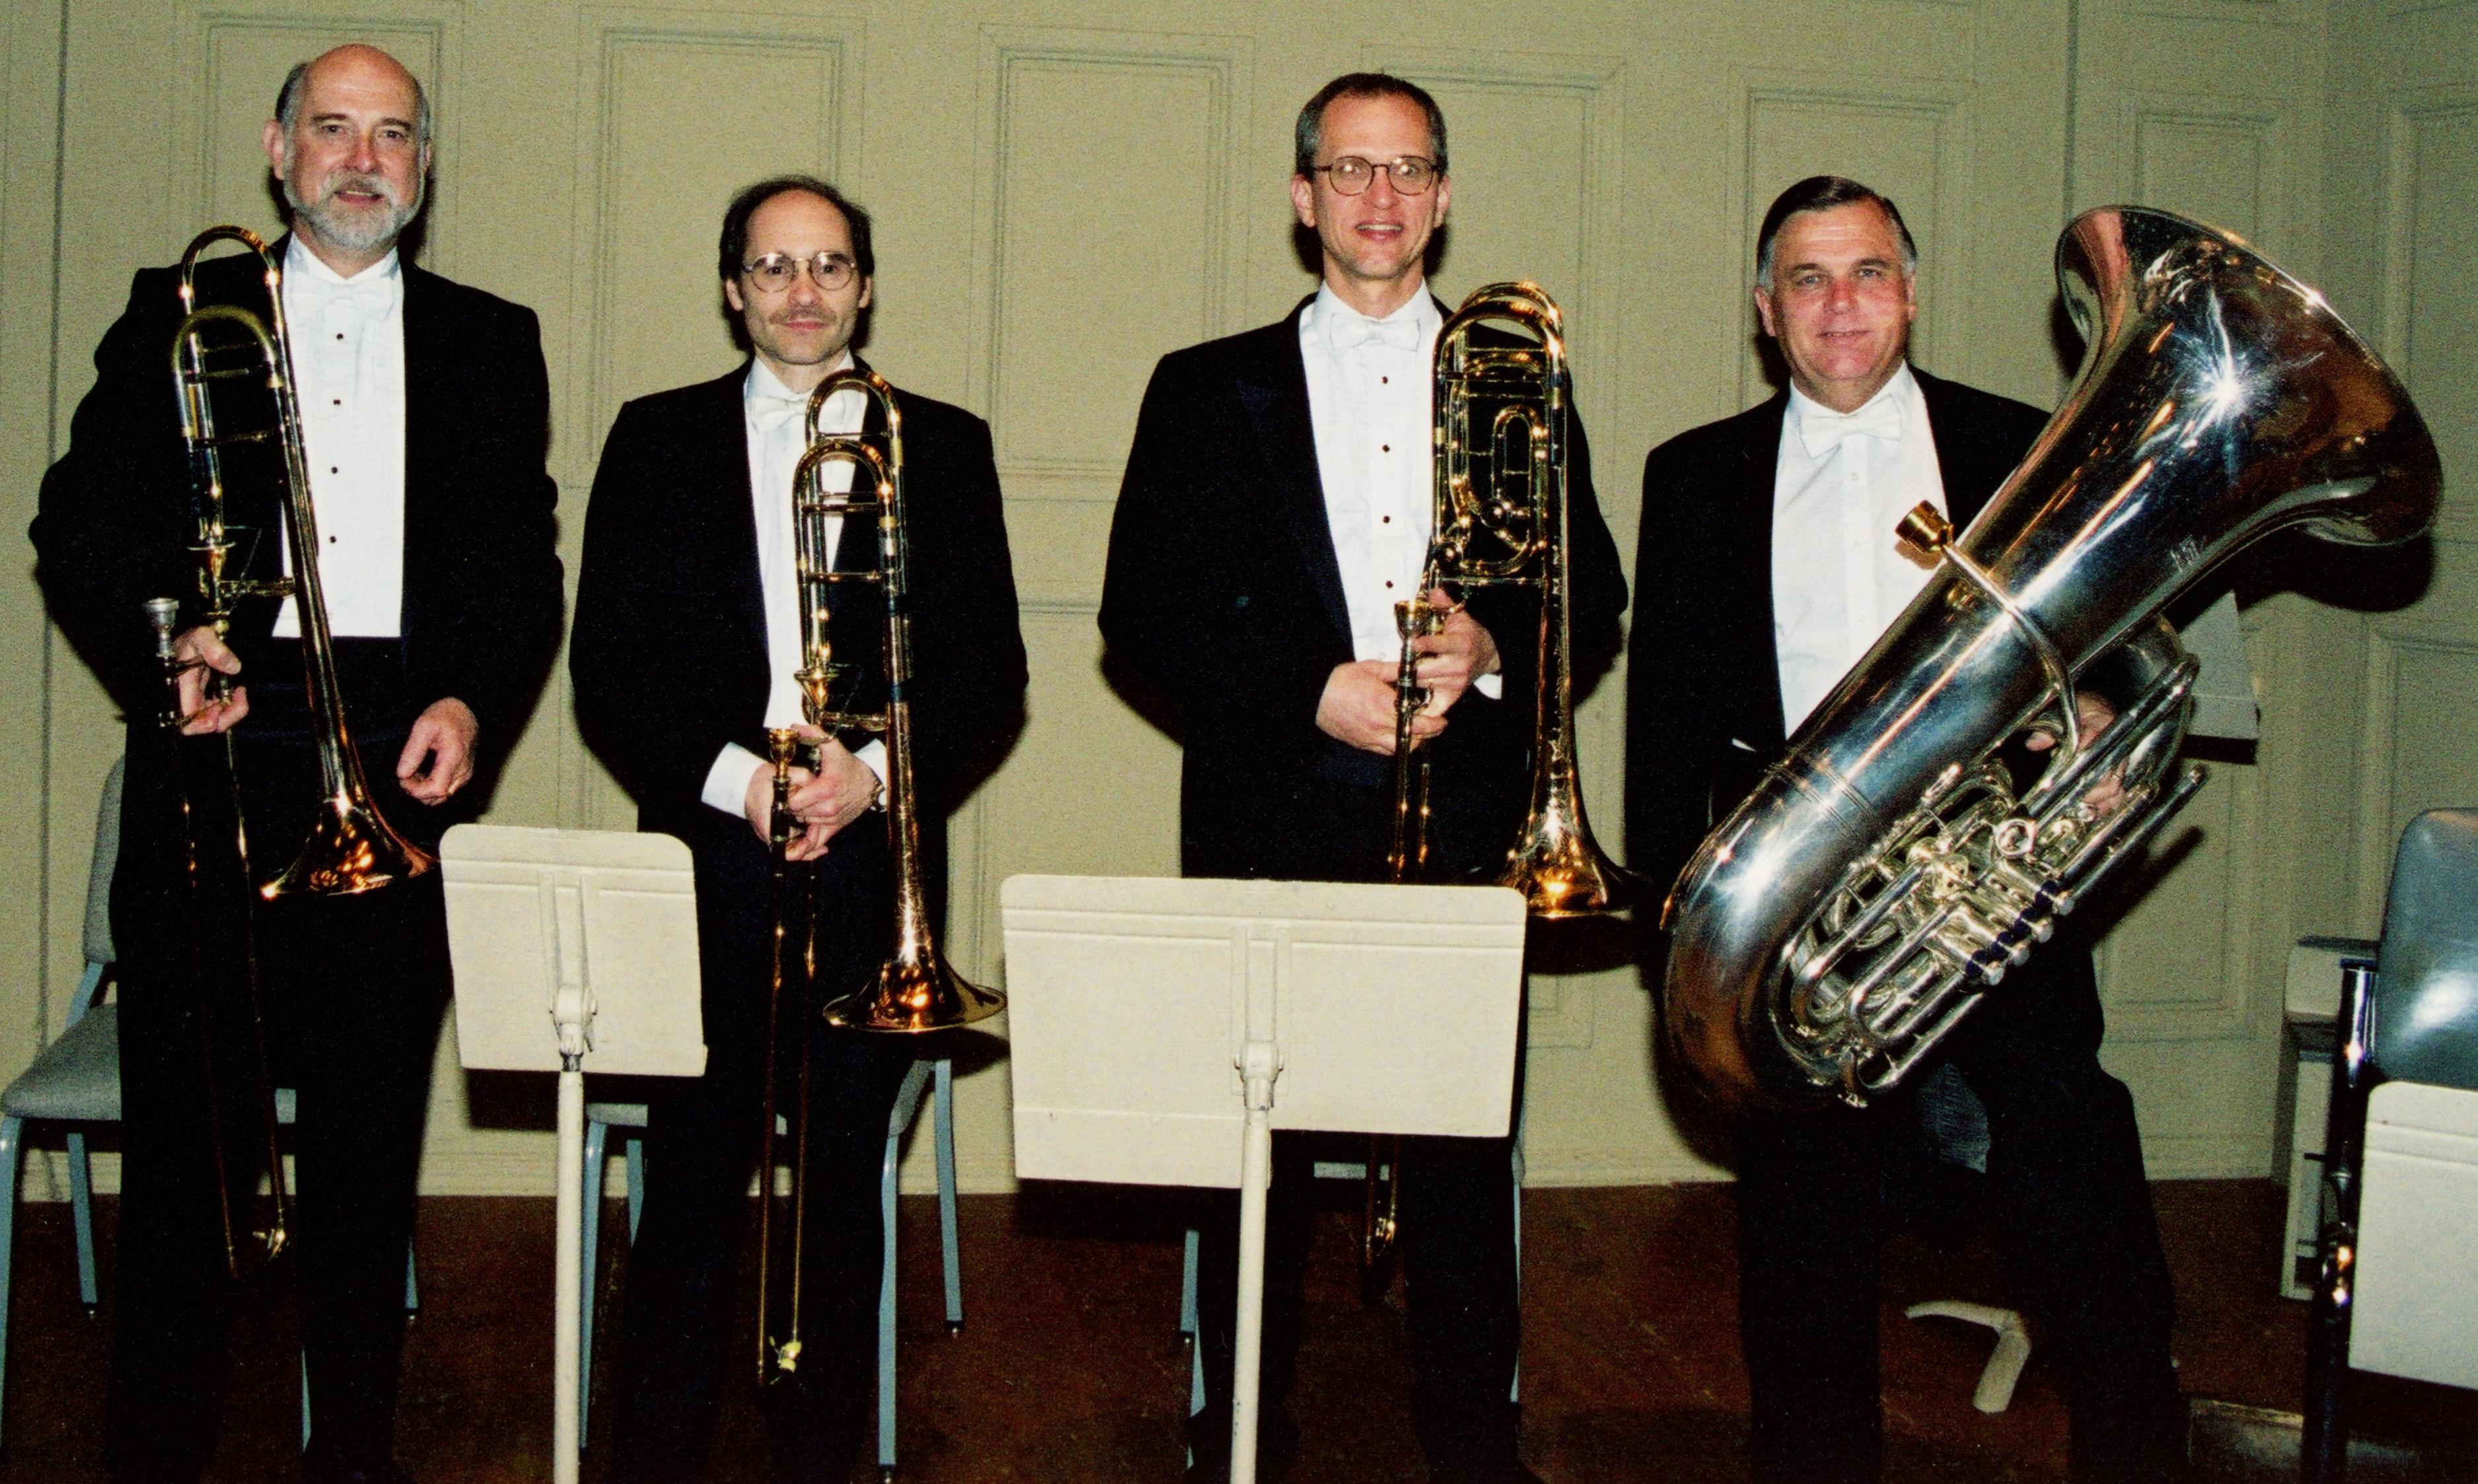 Boston_Symphony_low_brass_section_Barron_Bolter_Yeo_Schmitz_2001_standing